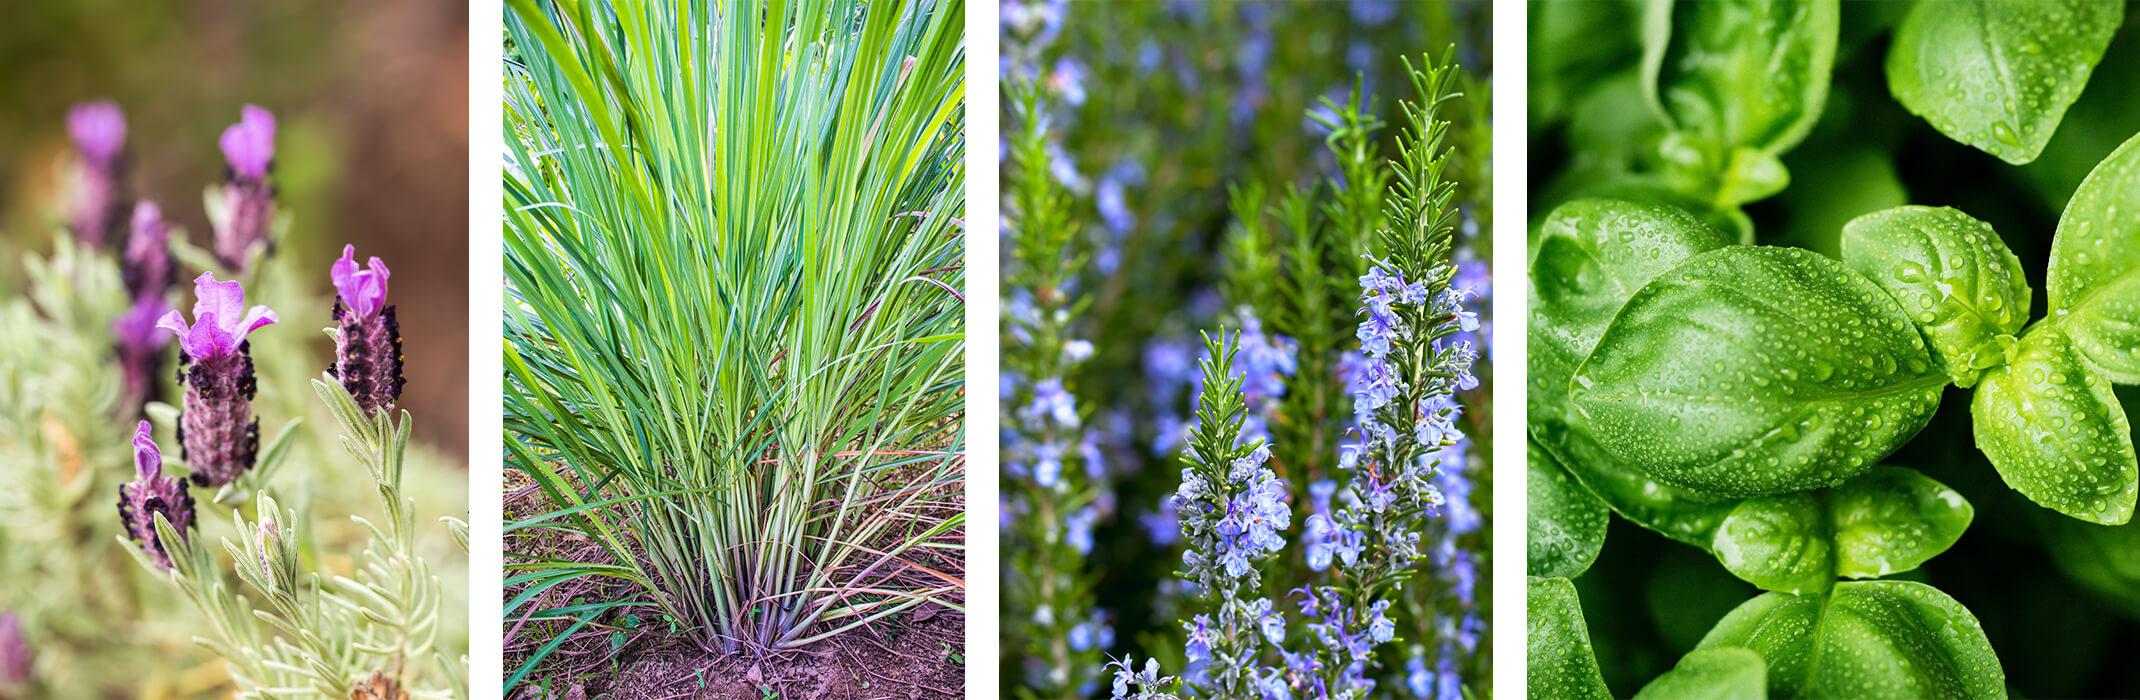 4 images: lavender closeup, lemongrass, rosemary, and basil